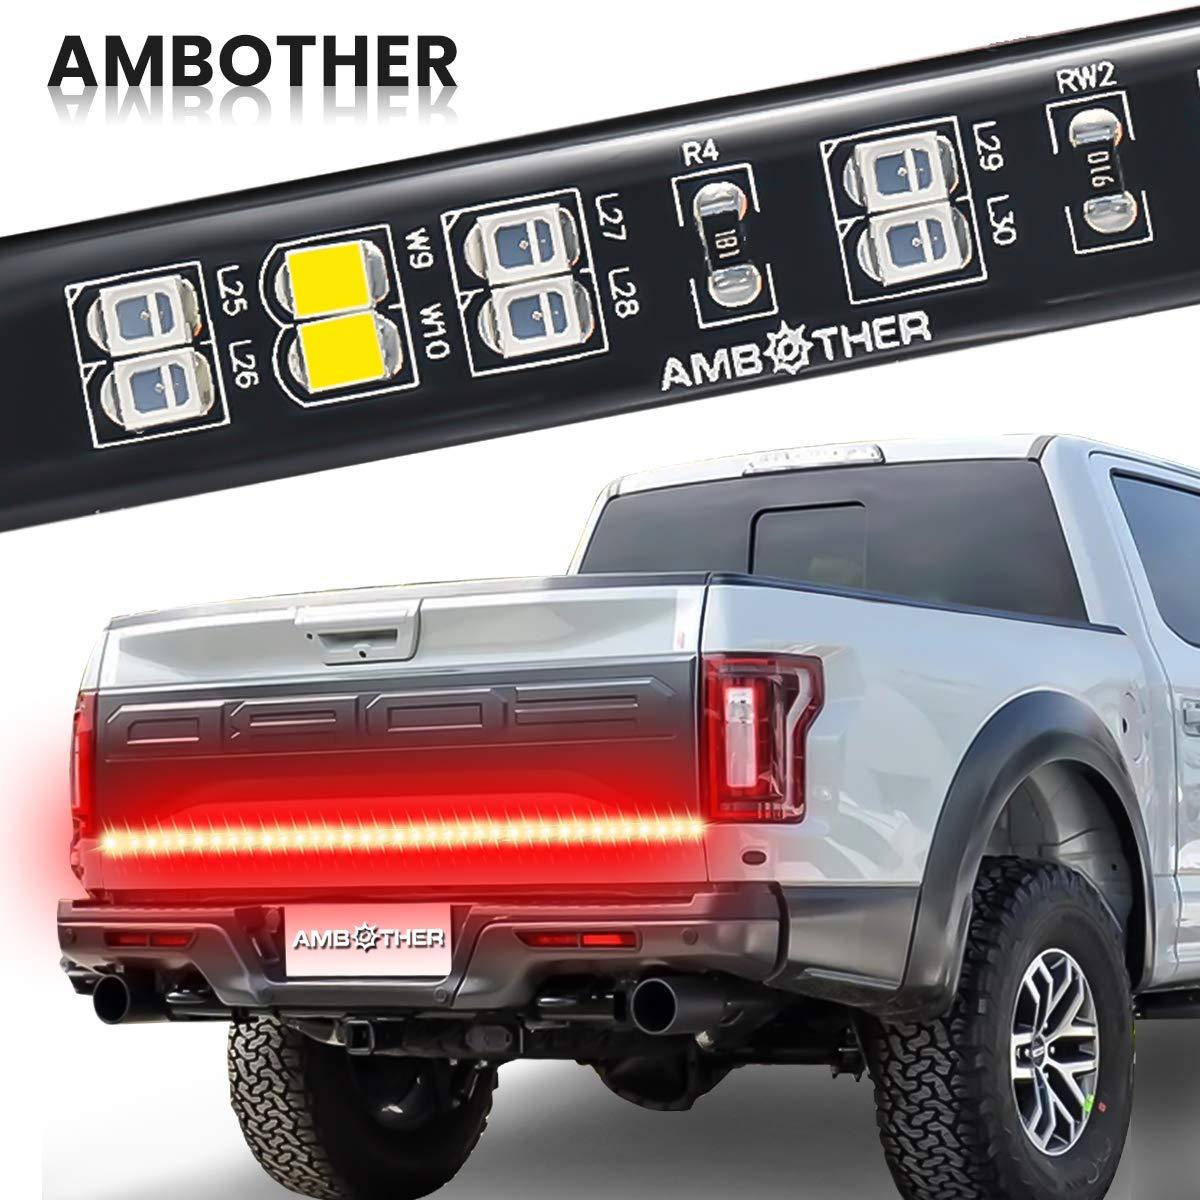 Tailgate Light Bar AMBOTHER 60'' Double Row Tail Light Strip Flexible  Reverse Running Brake Turn Signal LED Light for Truck Pickup Jeep SUV RV  Trailer Van, ...